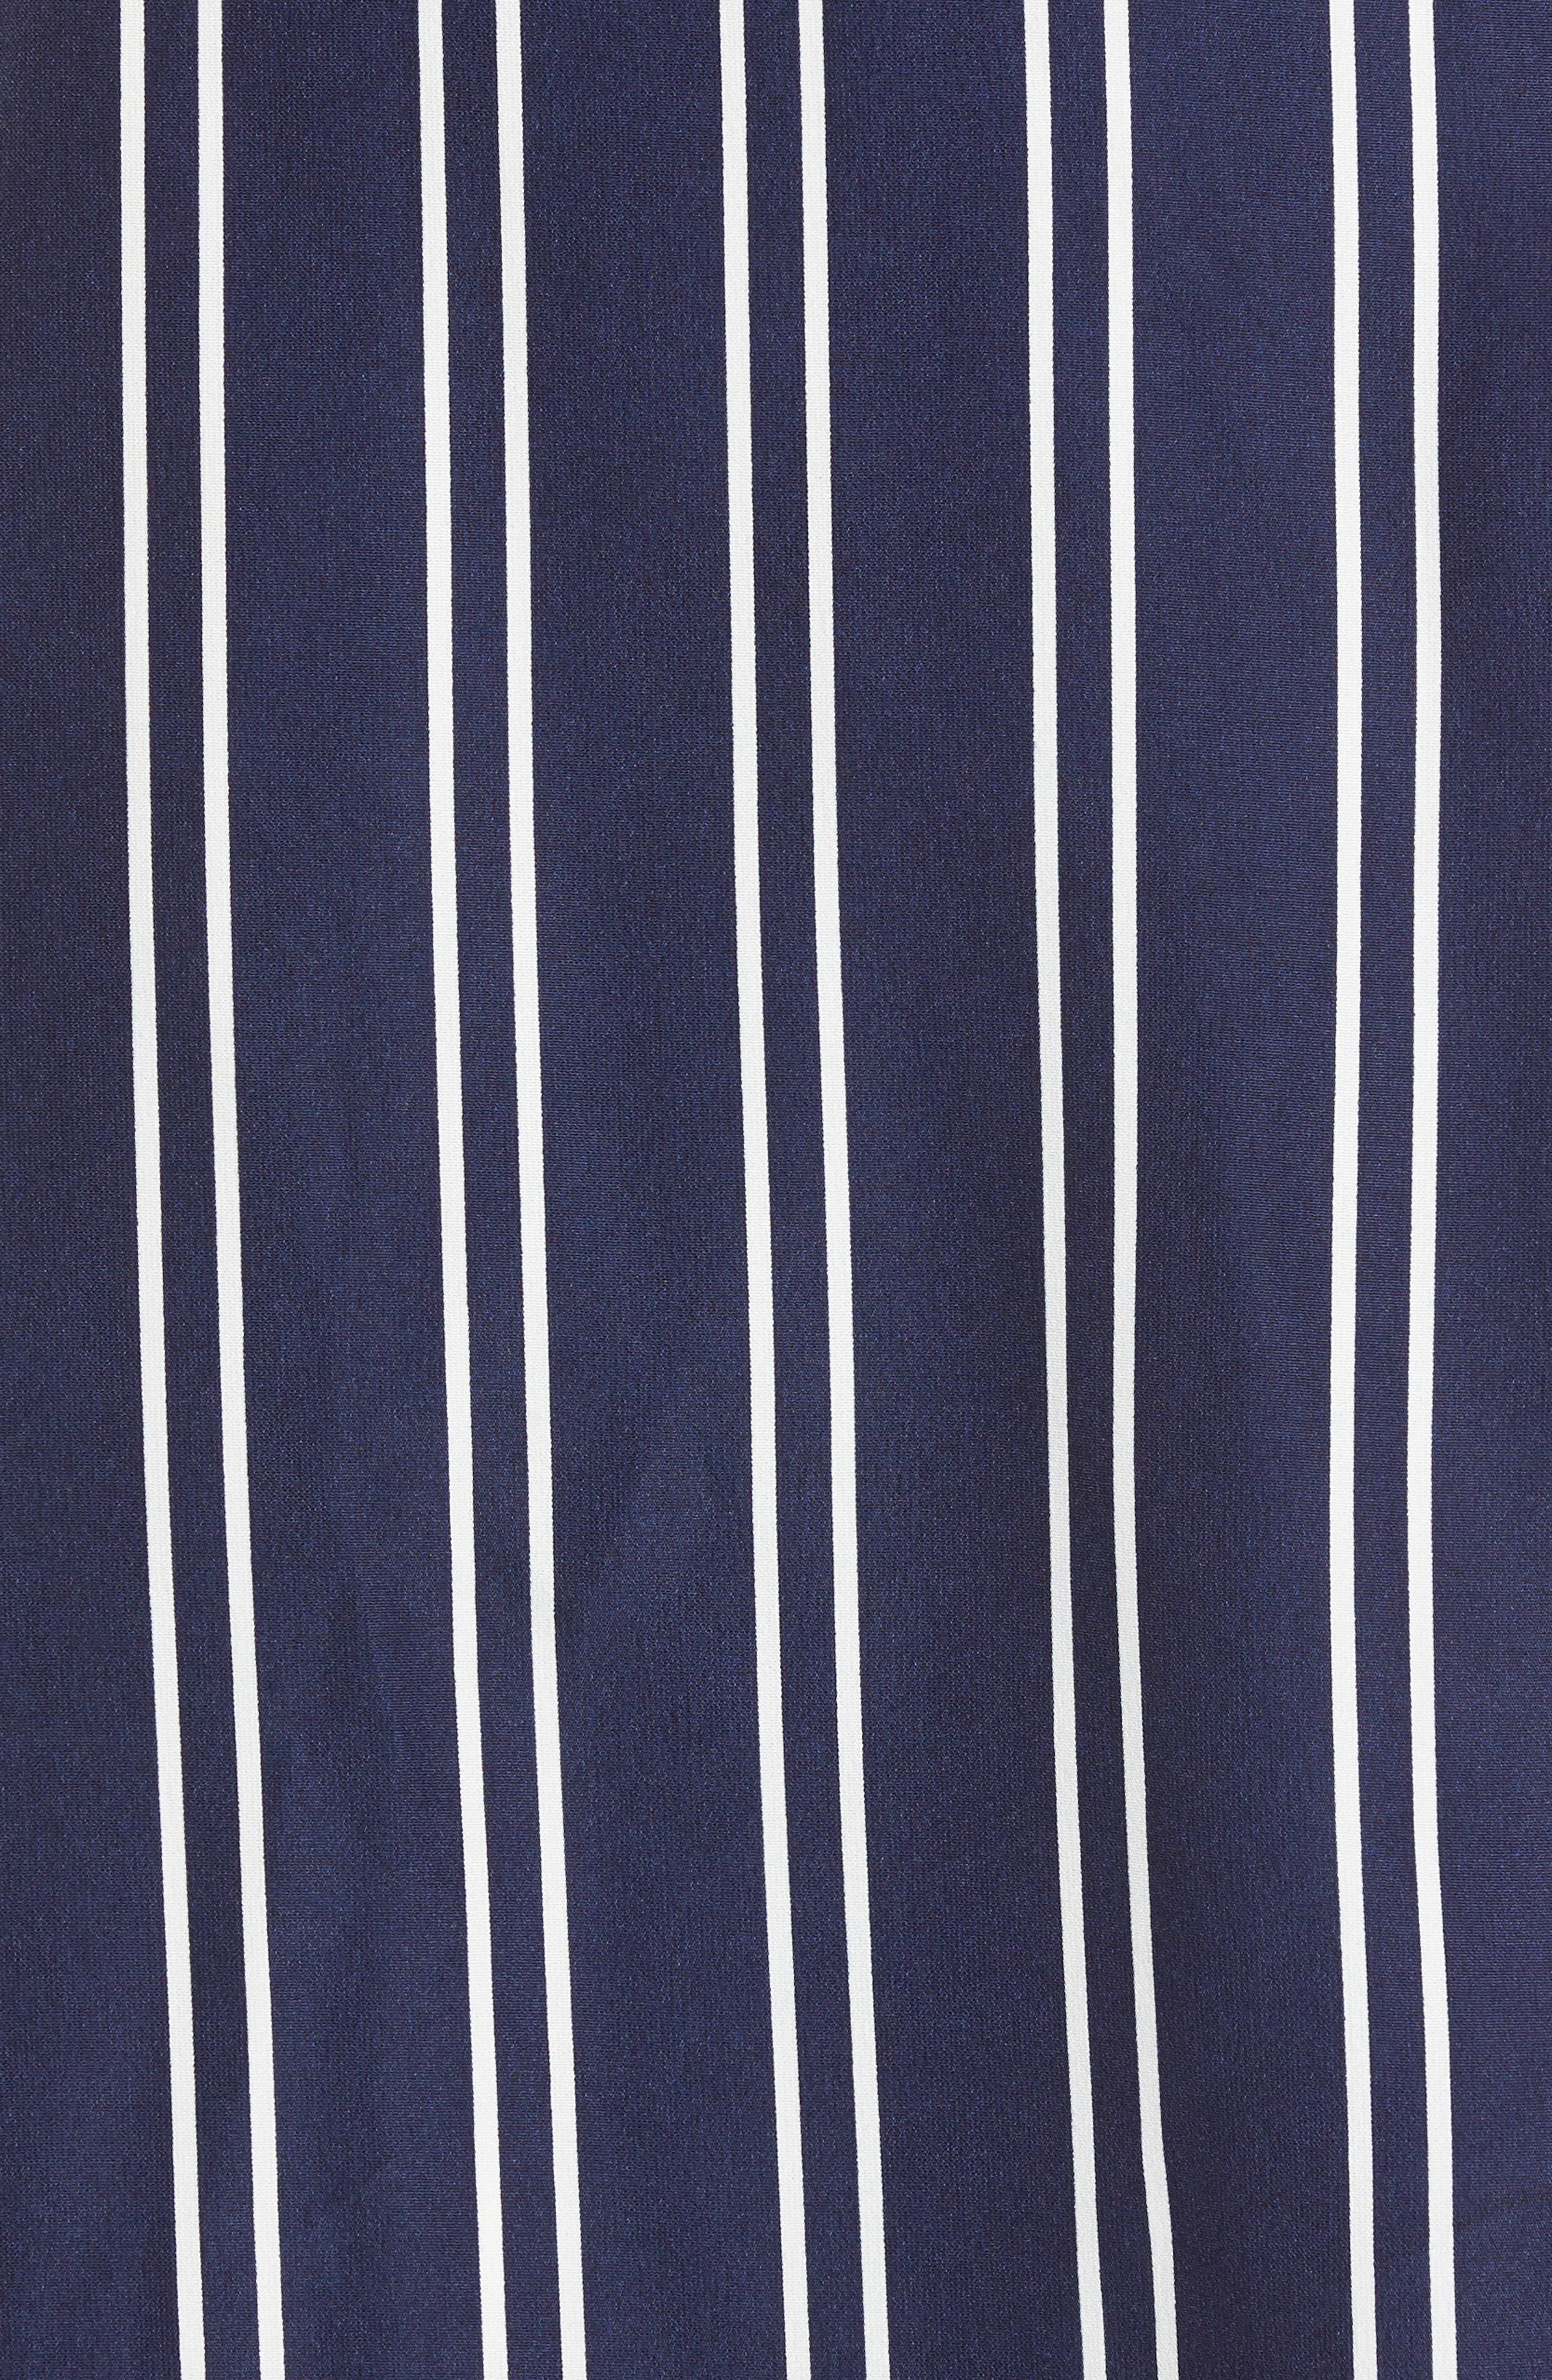 Stripe Wrap Midi Dress,                             Alternate thumbnail 5, color,                             Navy